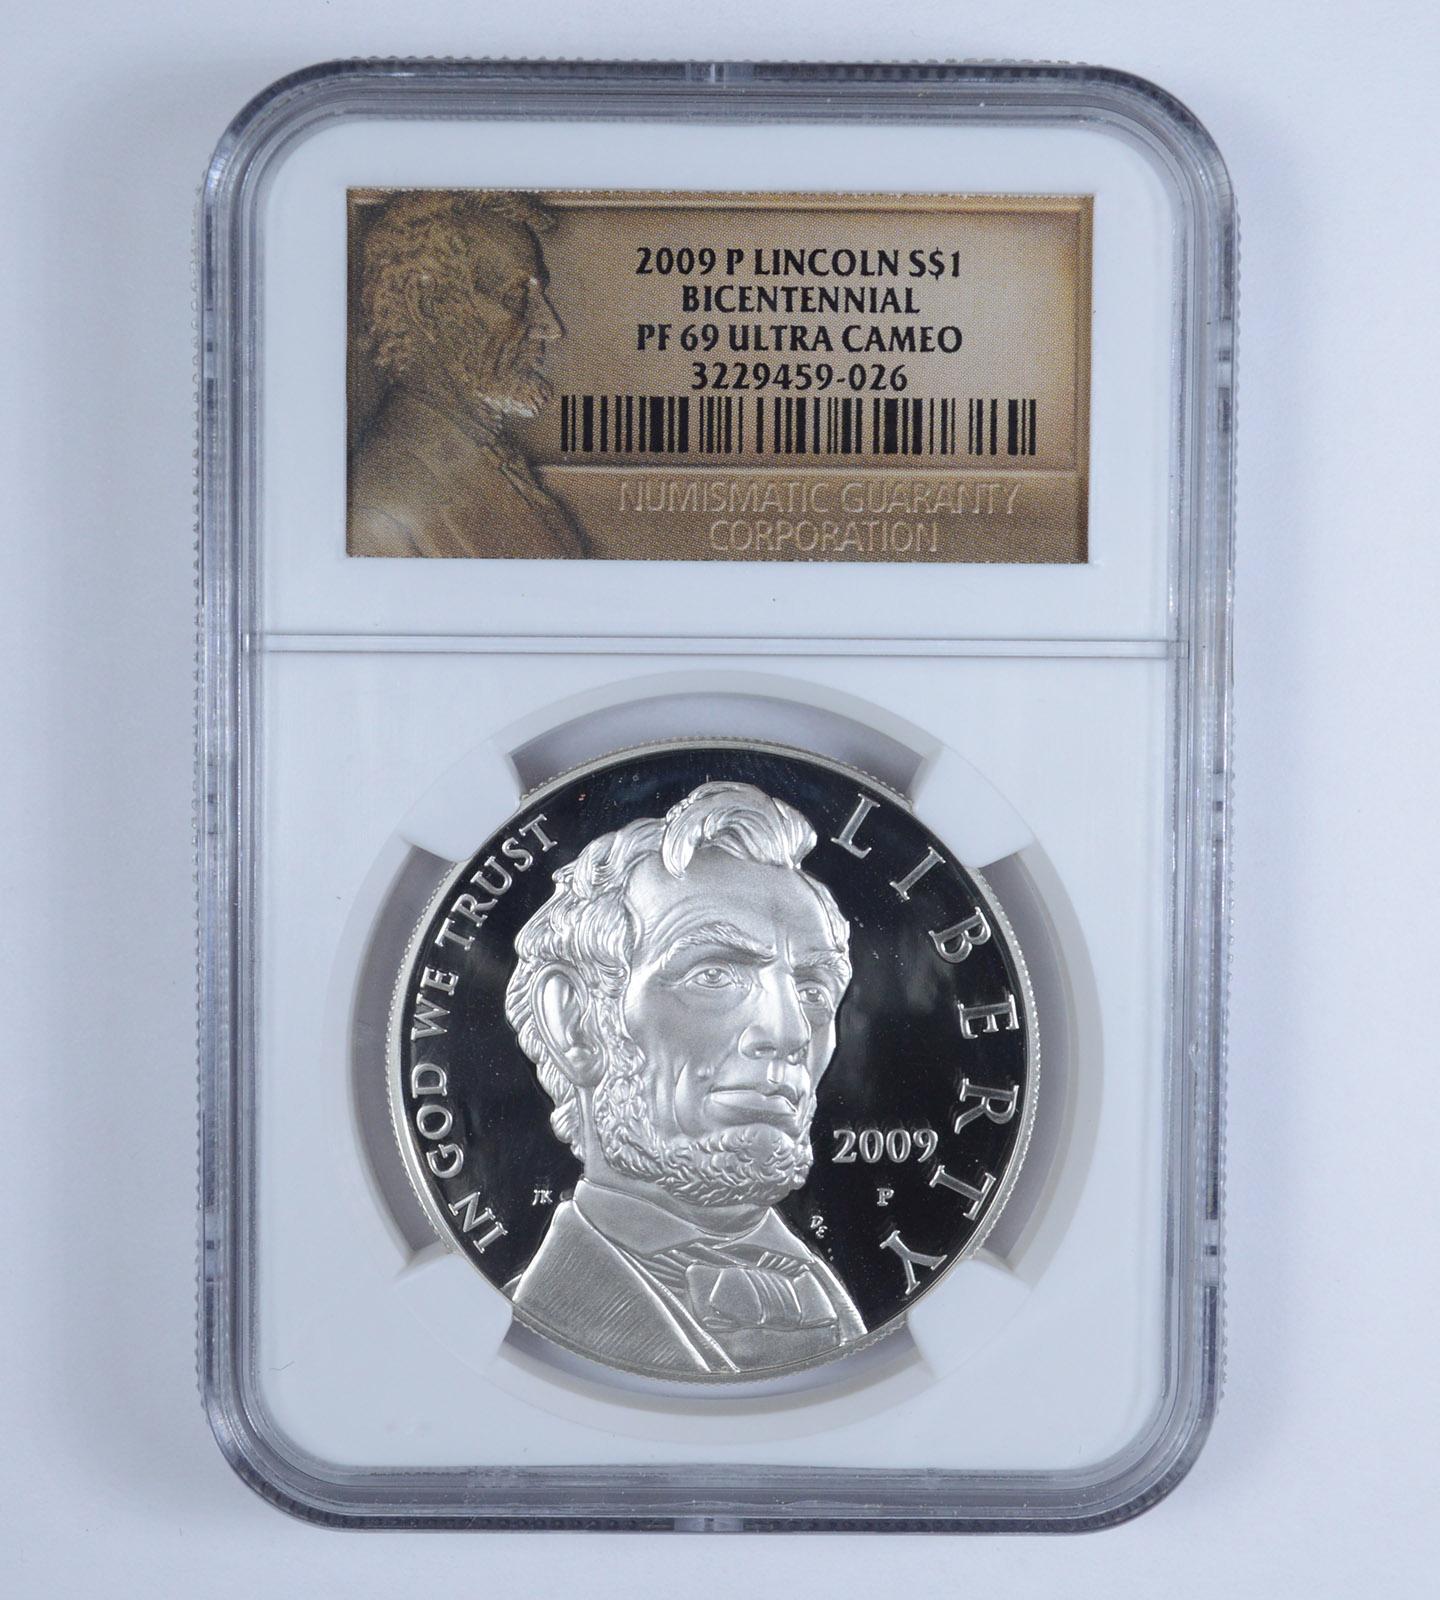 2009 P Lincoln Bicentennial Silver Dollar NGC PF70 Ultra Cameo